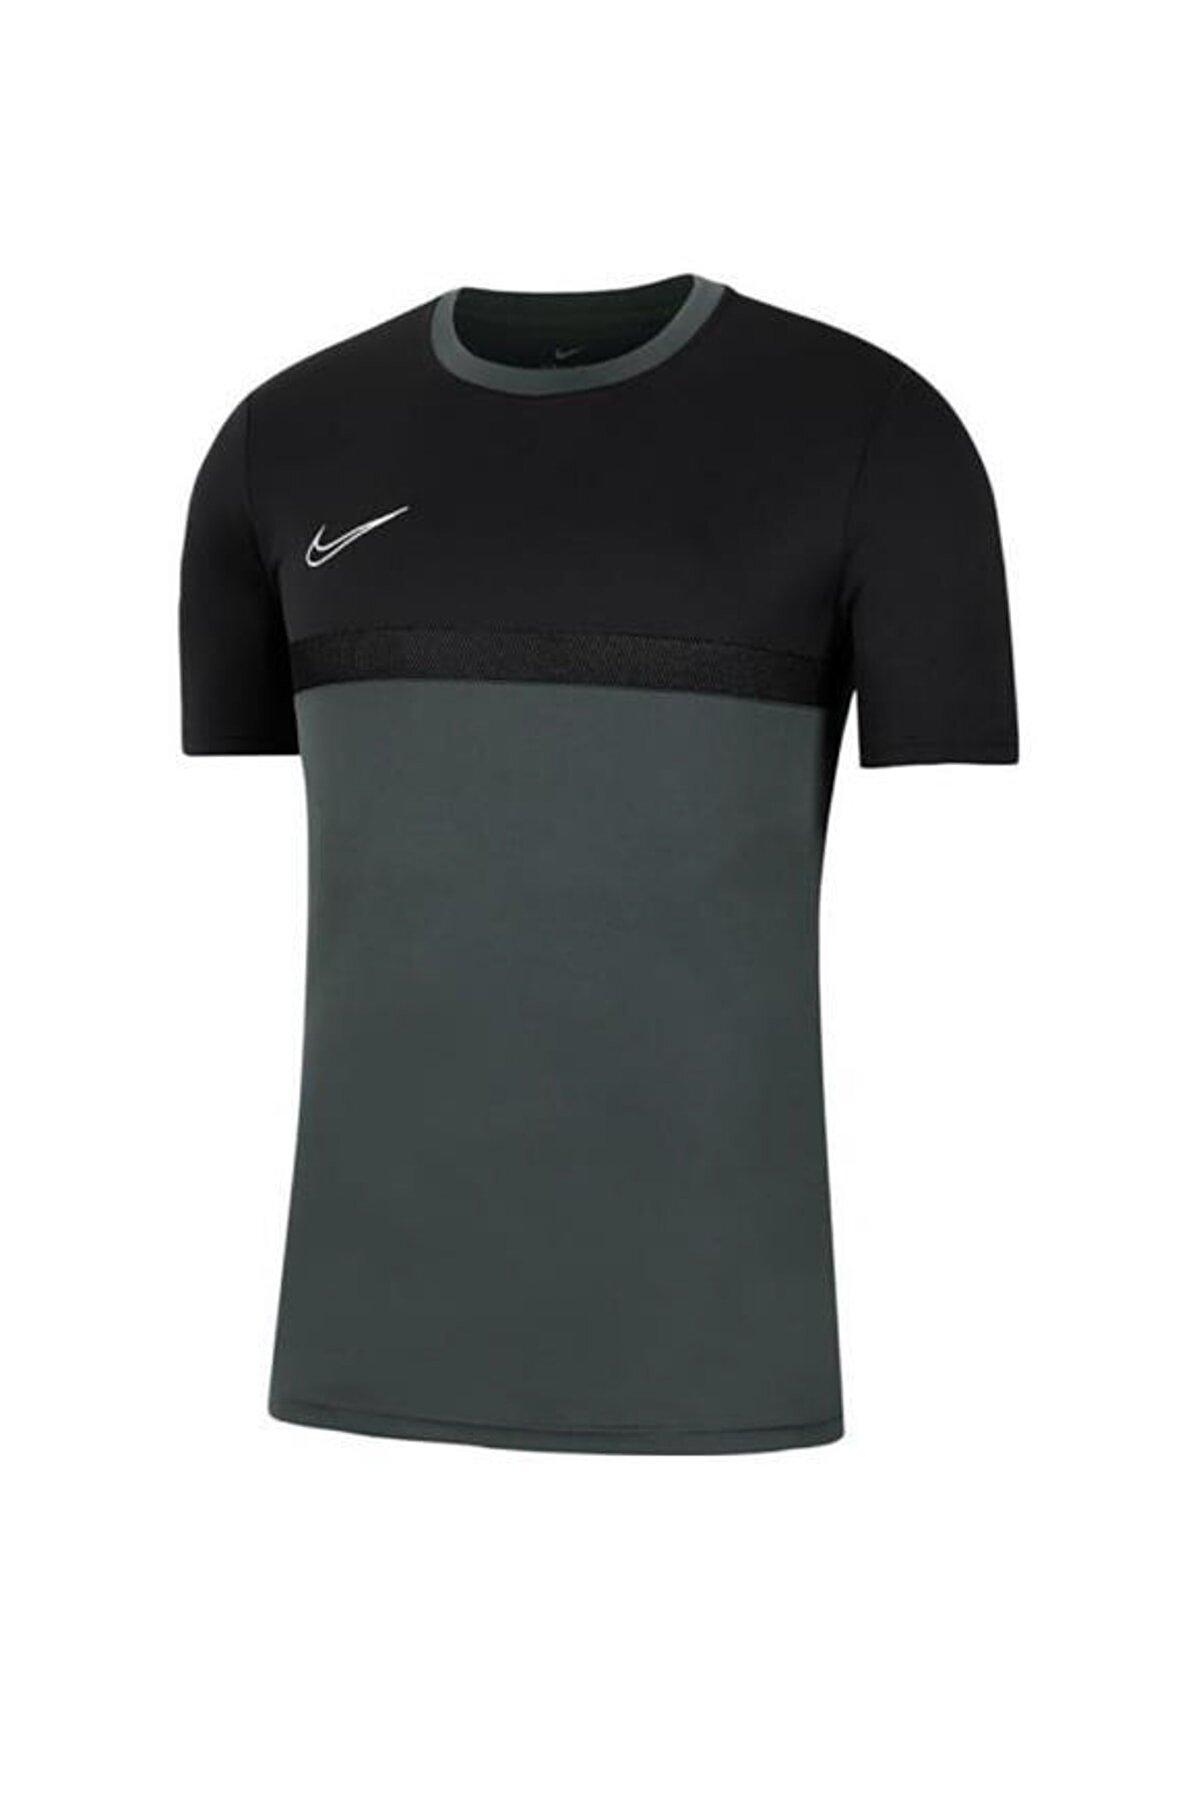 Nike M Dry ACDPR Top BV6926-073 Erkek Tişört